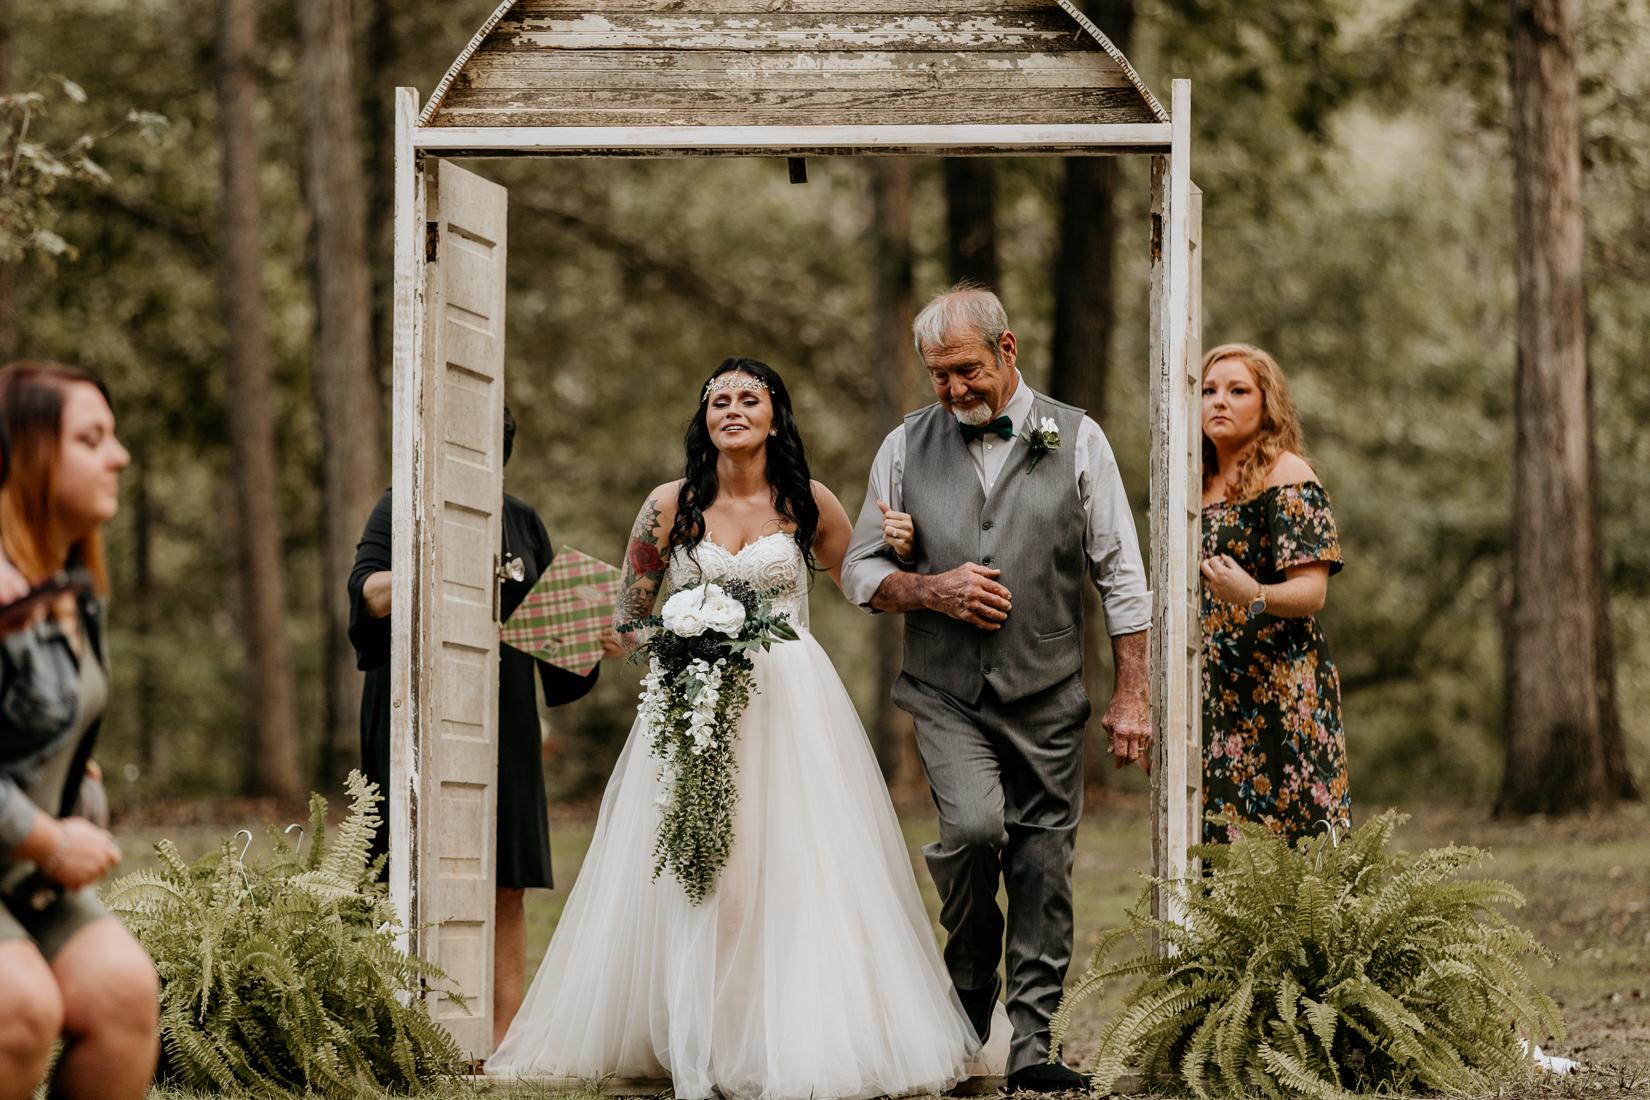 olivia_zay_wedding_09_2018-9604.jpg